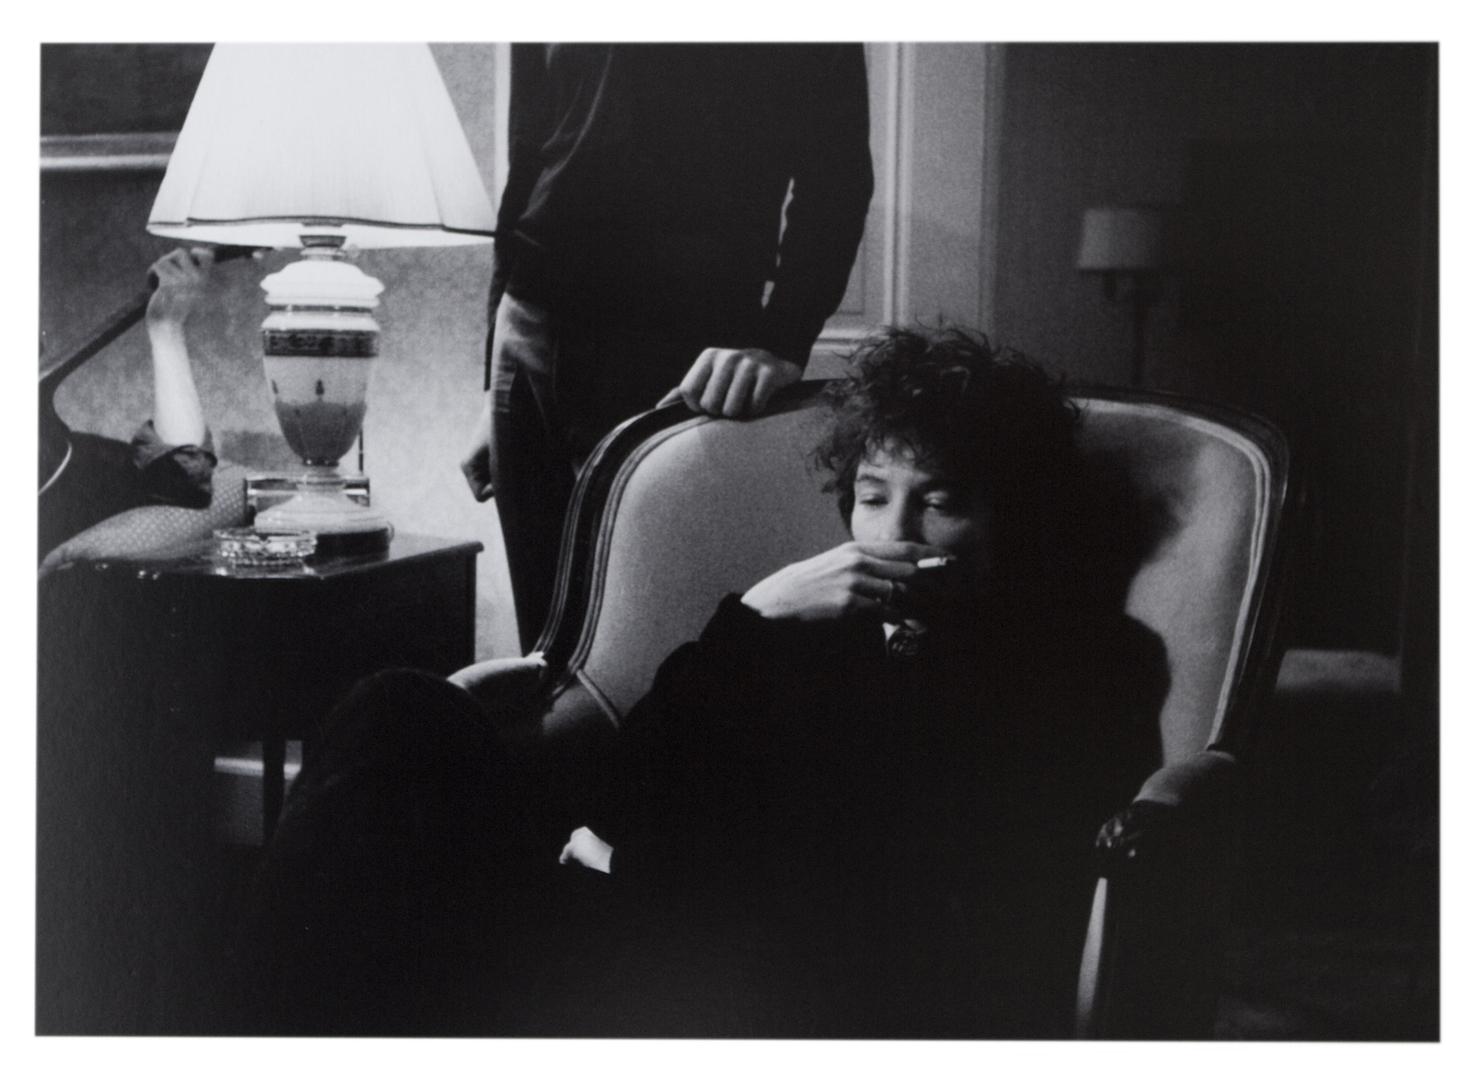 <p><span>Polaroids - Cate blanchett</span>, <br>Format: 29 x 36cm</p>